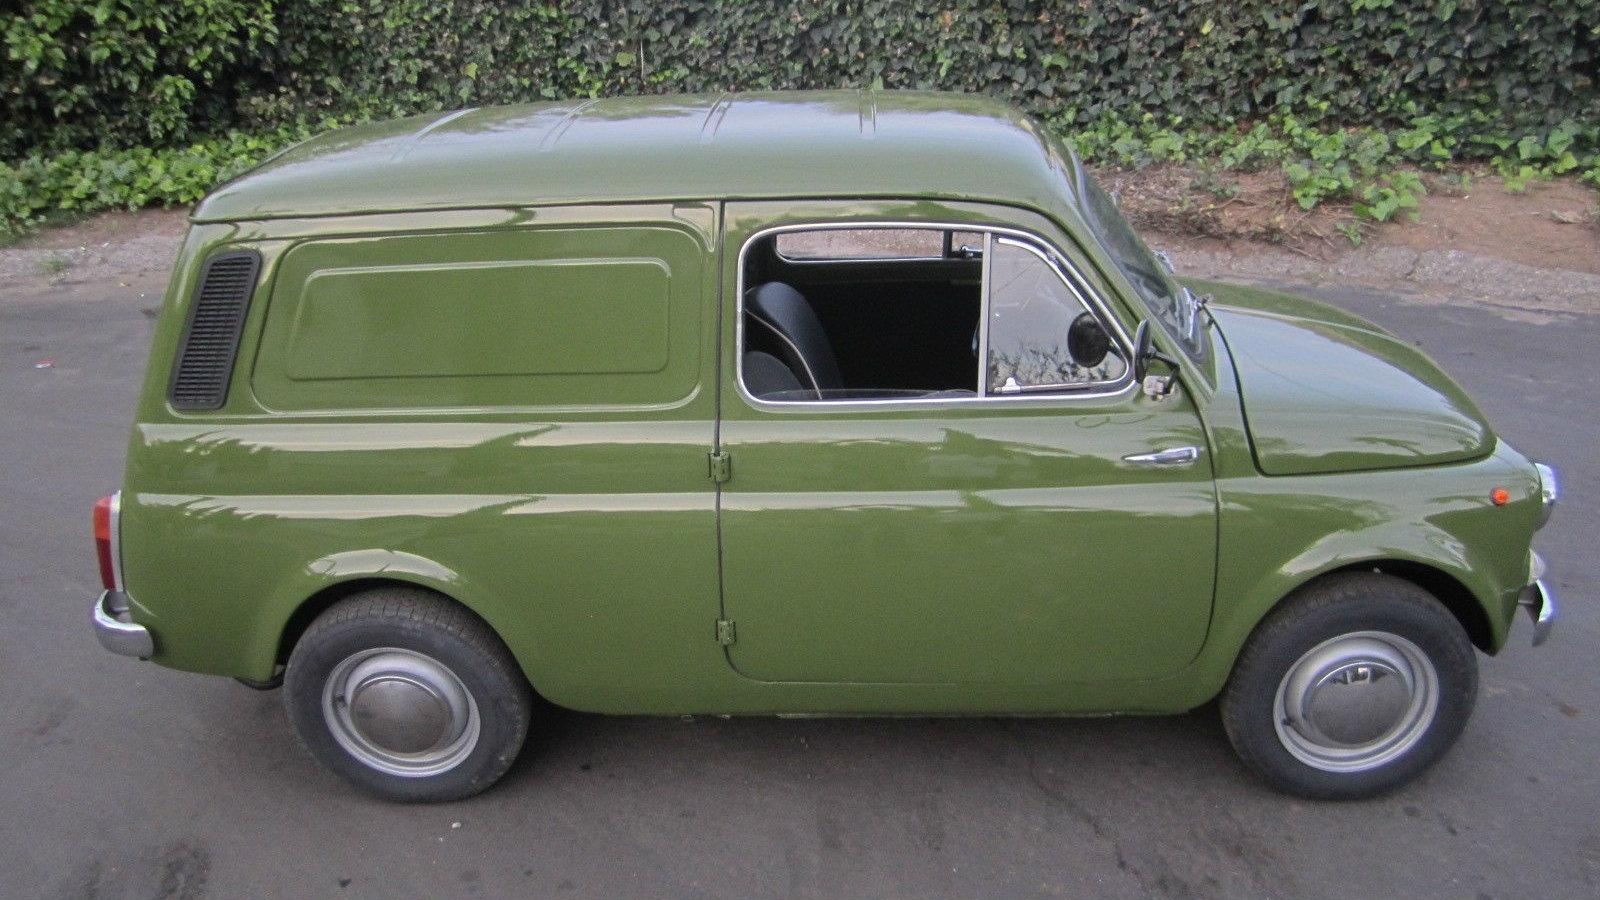 Fiat 500 For Sale >> 1972 Fiat 500 Furgoncino: Ex-TV & Movie Star